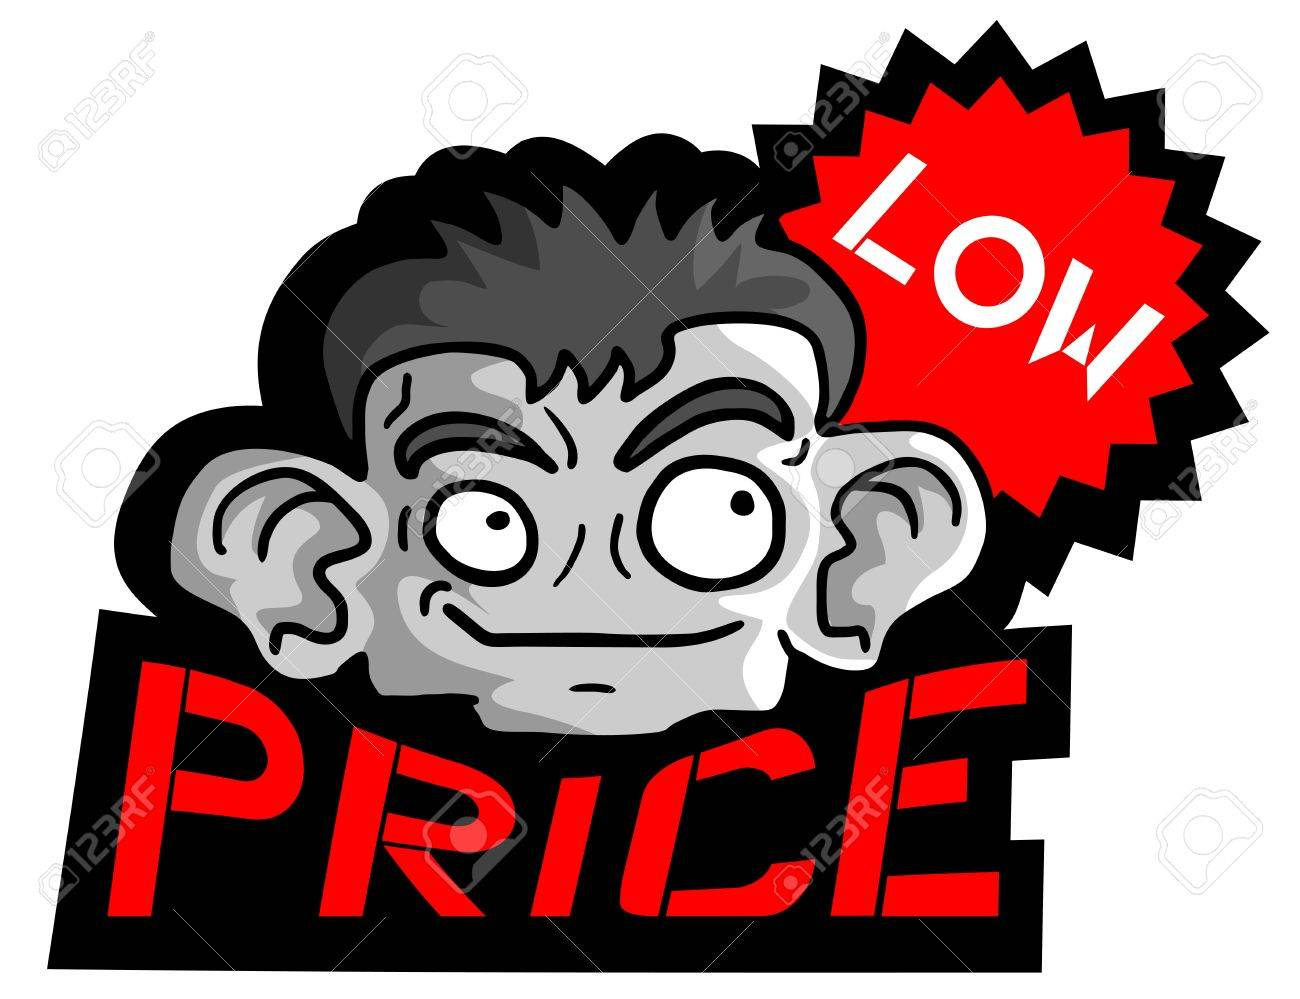 Low price Stock Vector - 19699655